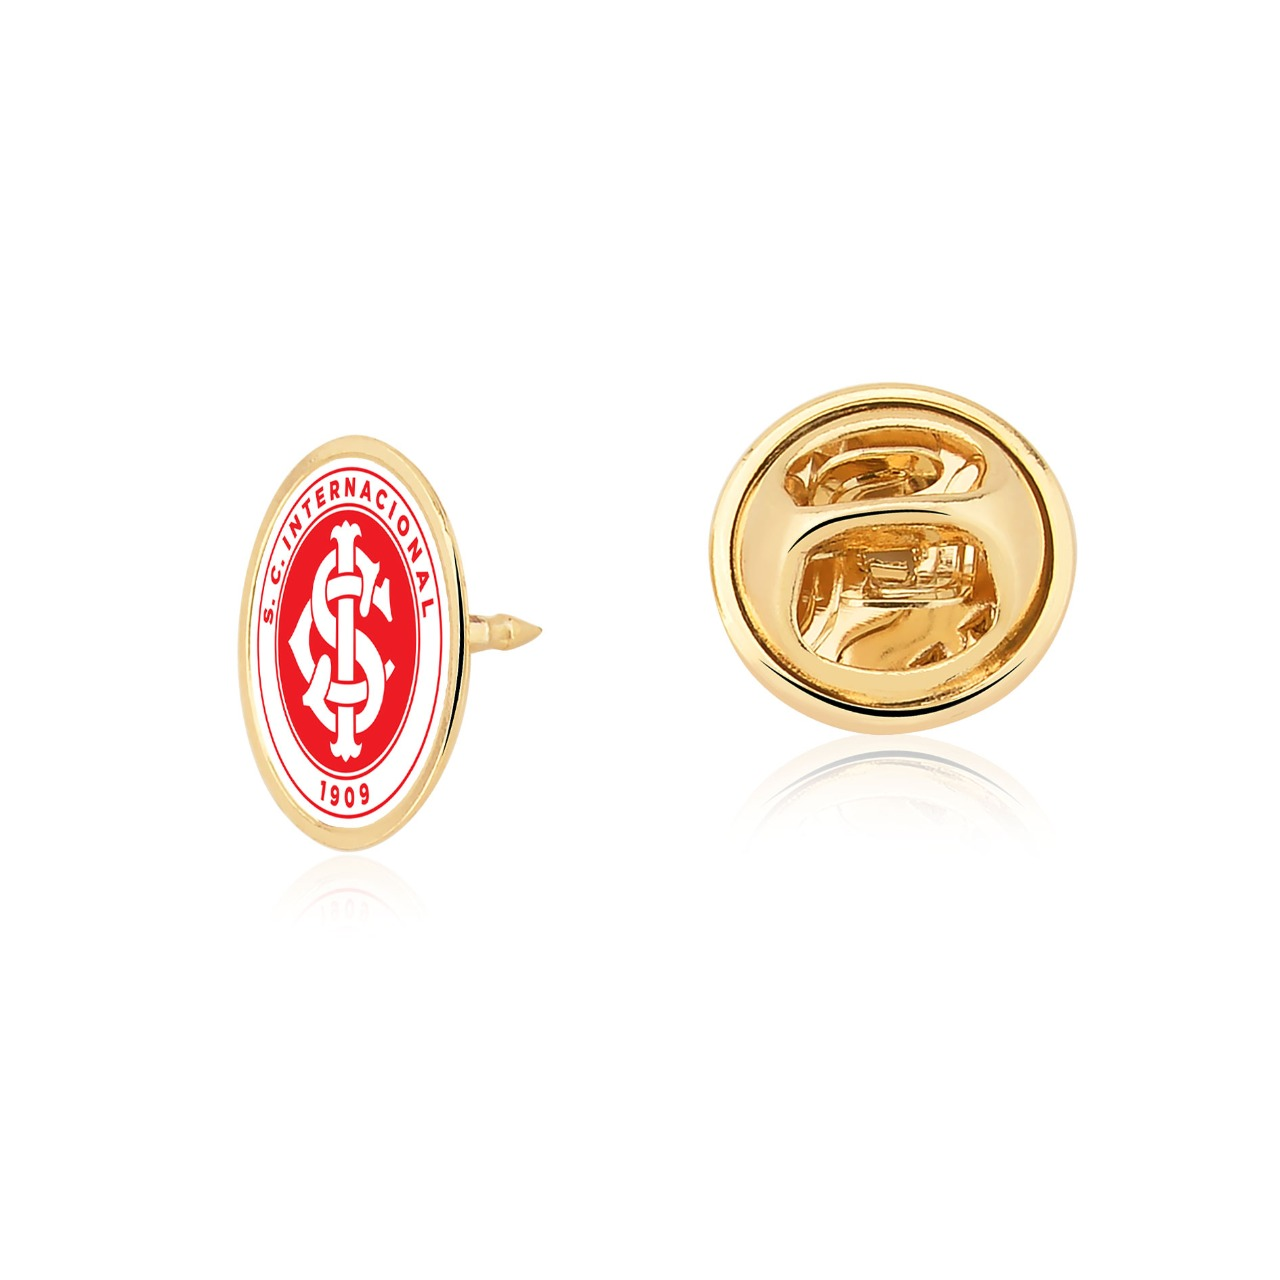 Pin 2 cm SCI Internacional Folheado Ouro 18K